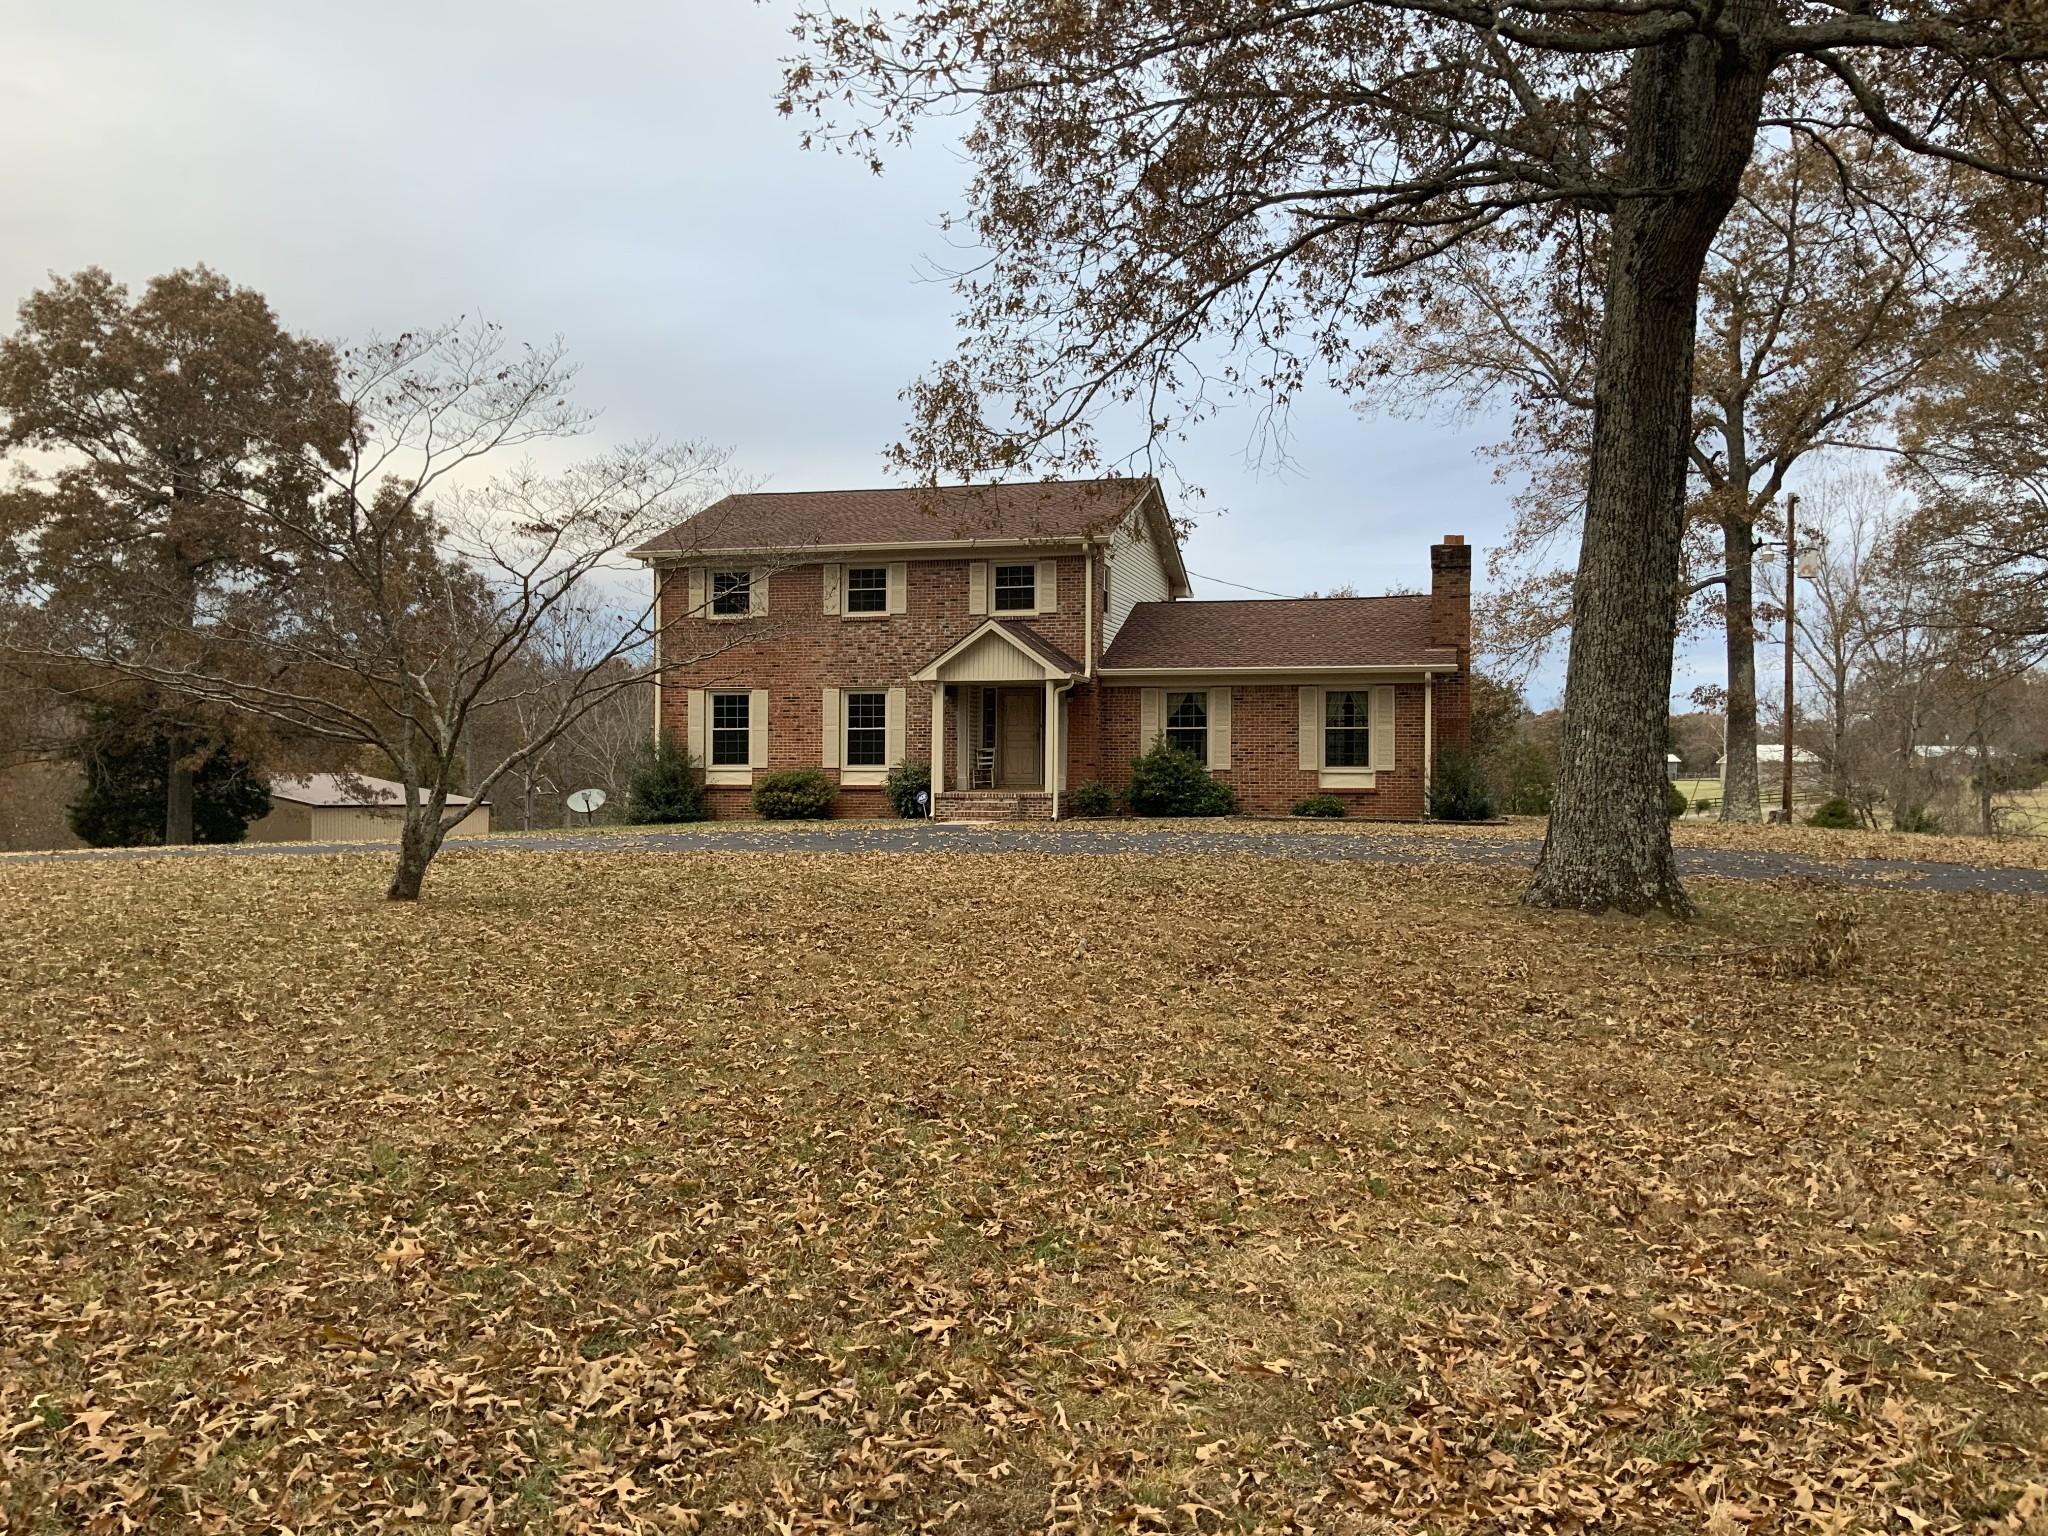 3920 Highway 47, N, Charlotte, TN 37036 - Charlotte, TN real estate listing